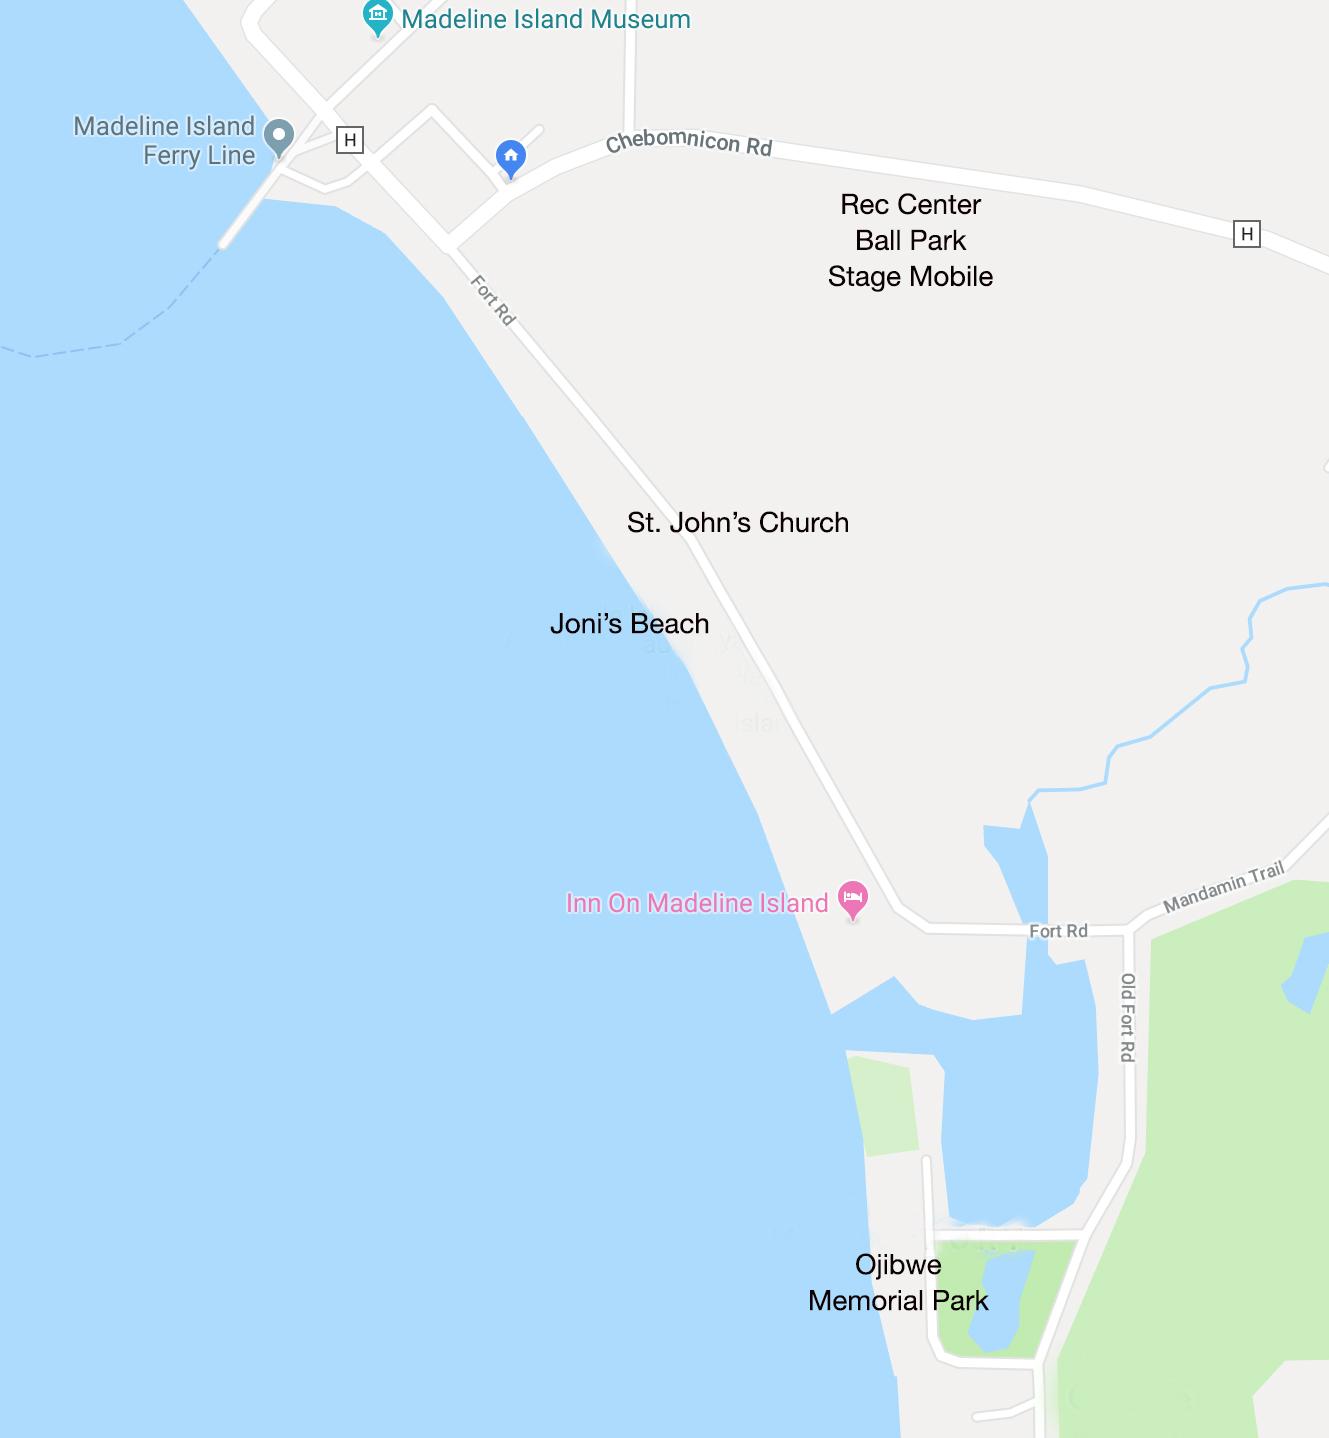 Madeline Island Jingle Dress Dancer – La Pointe Center for ... on cable map, osceola map, superior map, oconomowoc map, winter map, danbury map, big bay town park map, ashland map, apostle islands map, green lake map, isle royale map, langlade county map, monroe map, whitewater map, big chetac lake map, wausau map, sparta map, madison map, great lakes map, rice lake map,